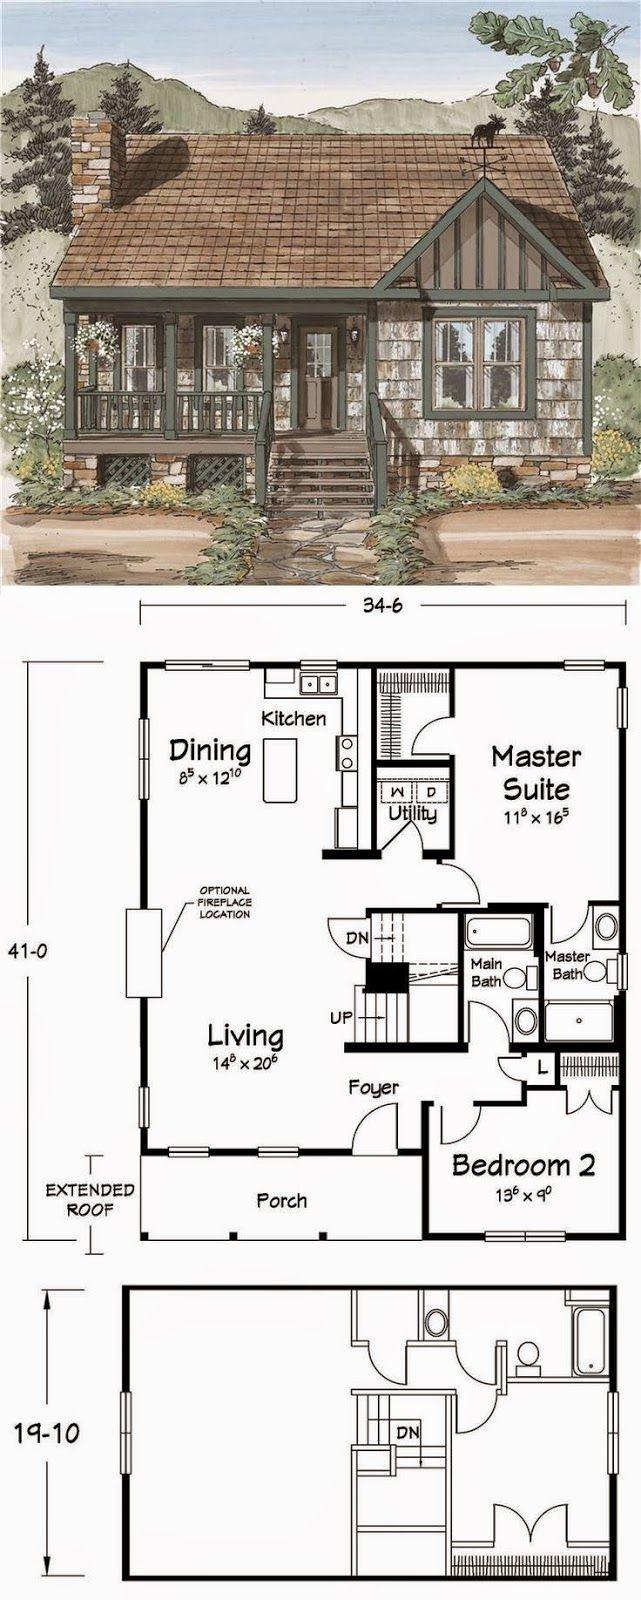 best 25 house swap ideas on pinterest home exchange house swap